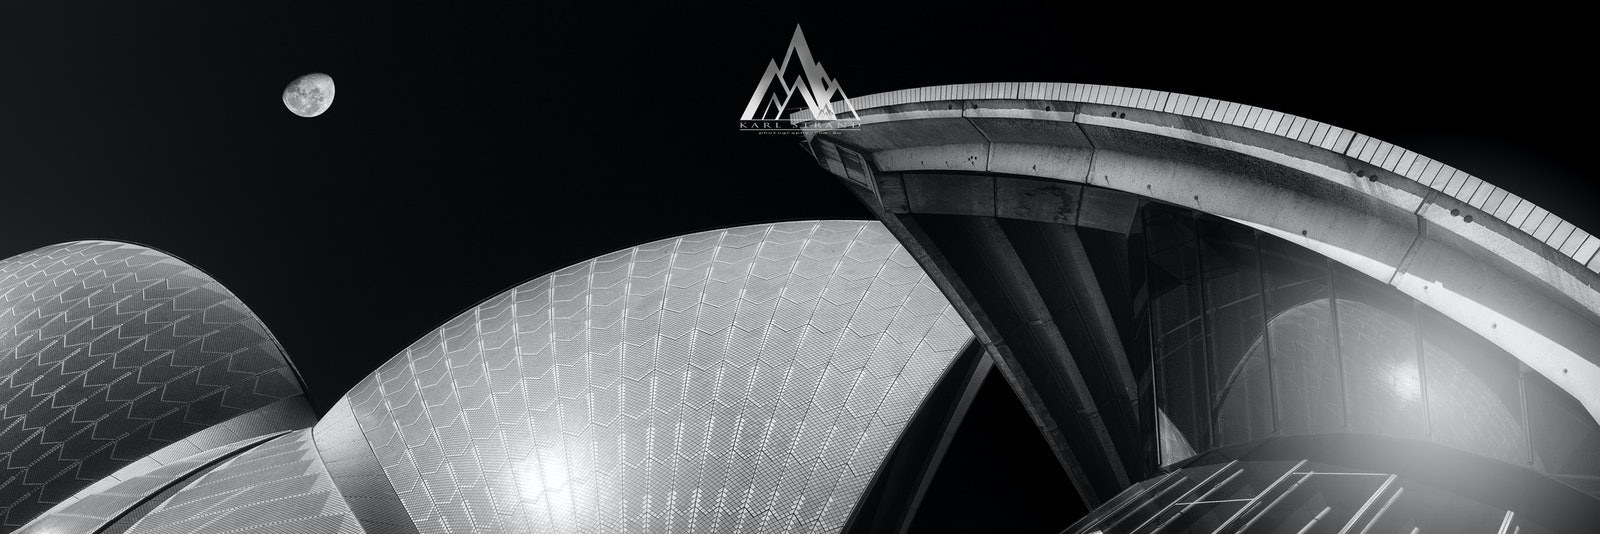 Opera Luna, Sydney Opera House, NSW Australia. - Opera Luna, Sydney Opera House, NSW Australia.  Creating and original composition of the Sydney Opera...